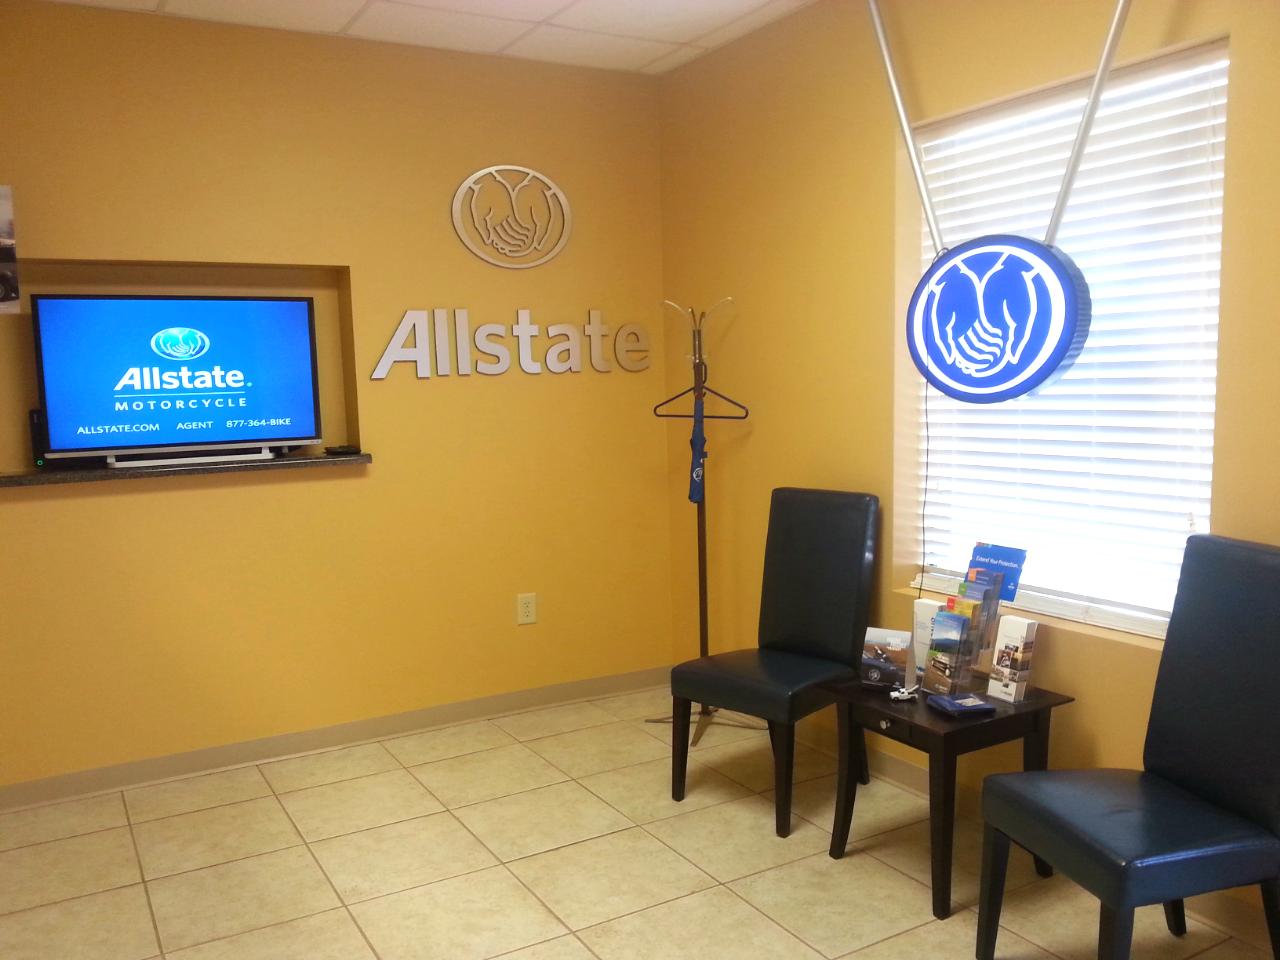 Betsy McArn: Allstate Insurance image 3